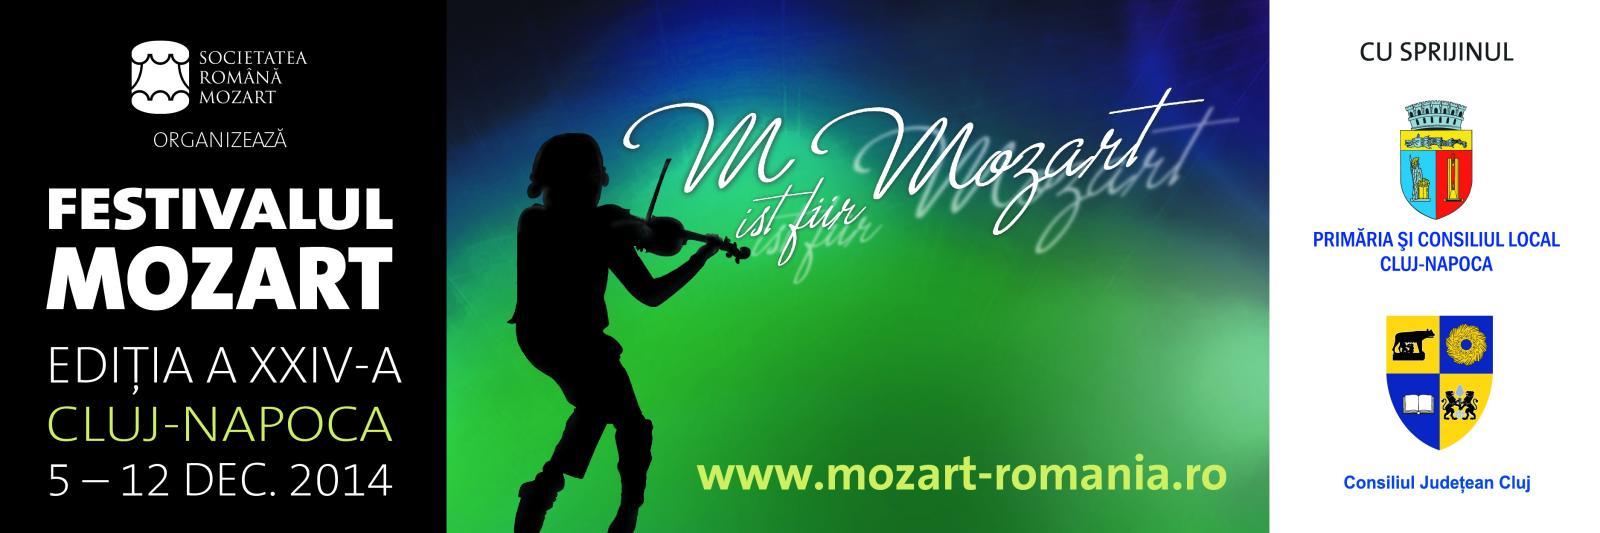 Festivalul Mozart 2014